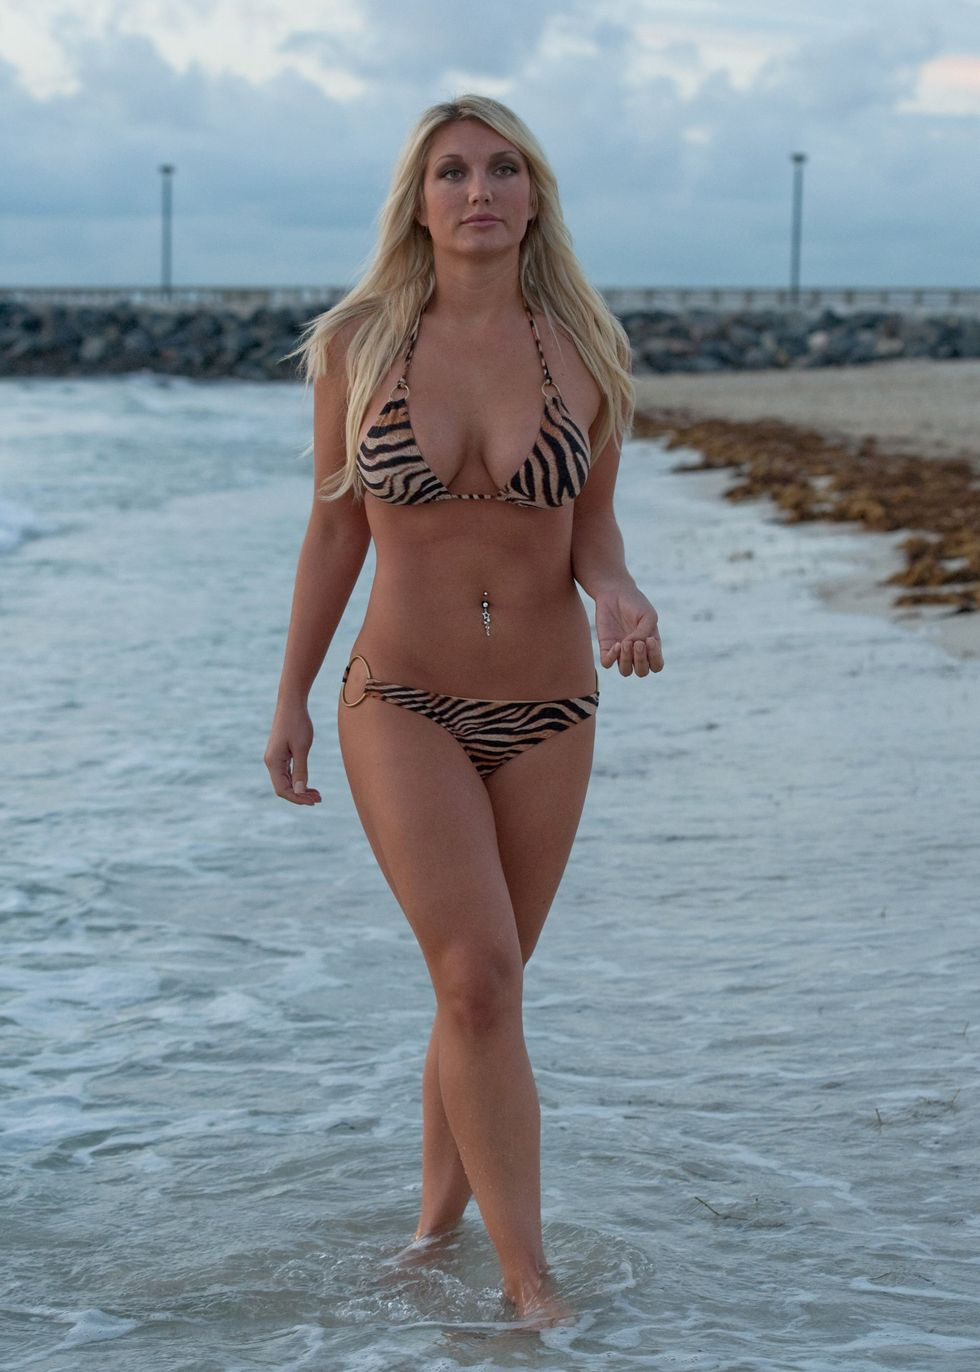 brooke hogan in bikini for a shoot in miami beach 07 | GotCeleb